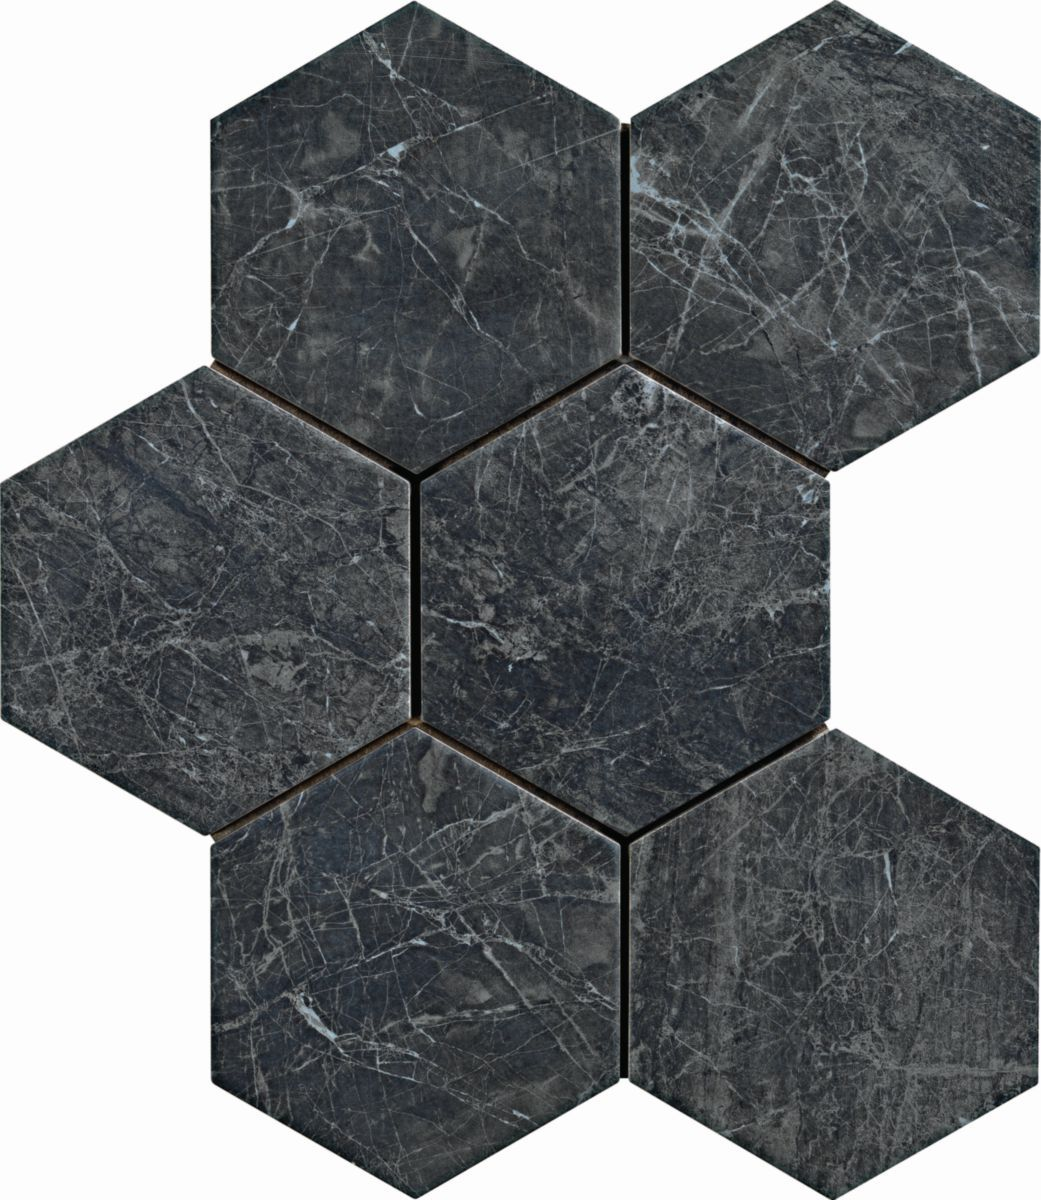 Carrelage Hexagonal Sol Interieur Gres Cerame Bistrot Infinity 21x18 2 Cm En 2020 Carrelage Hexagonal Hexagonaux Carrelage